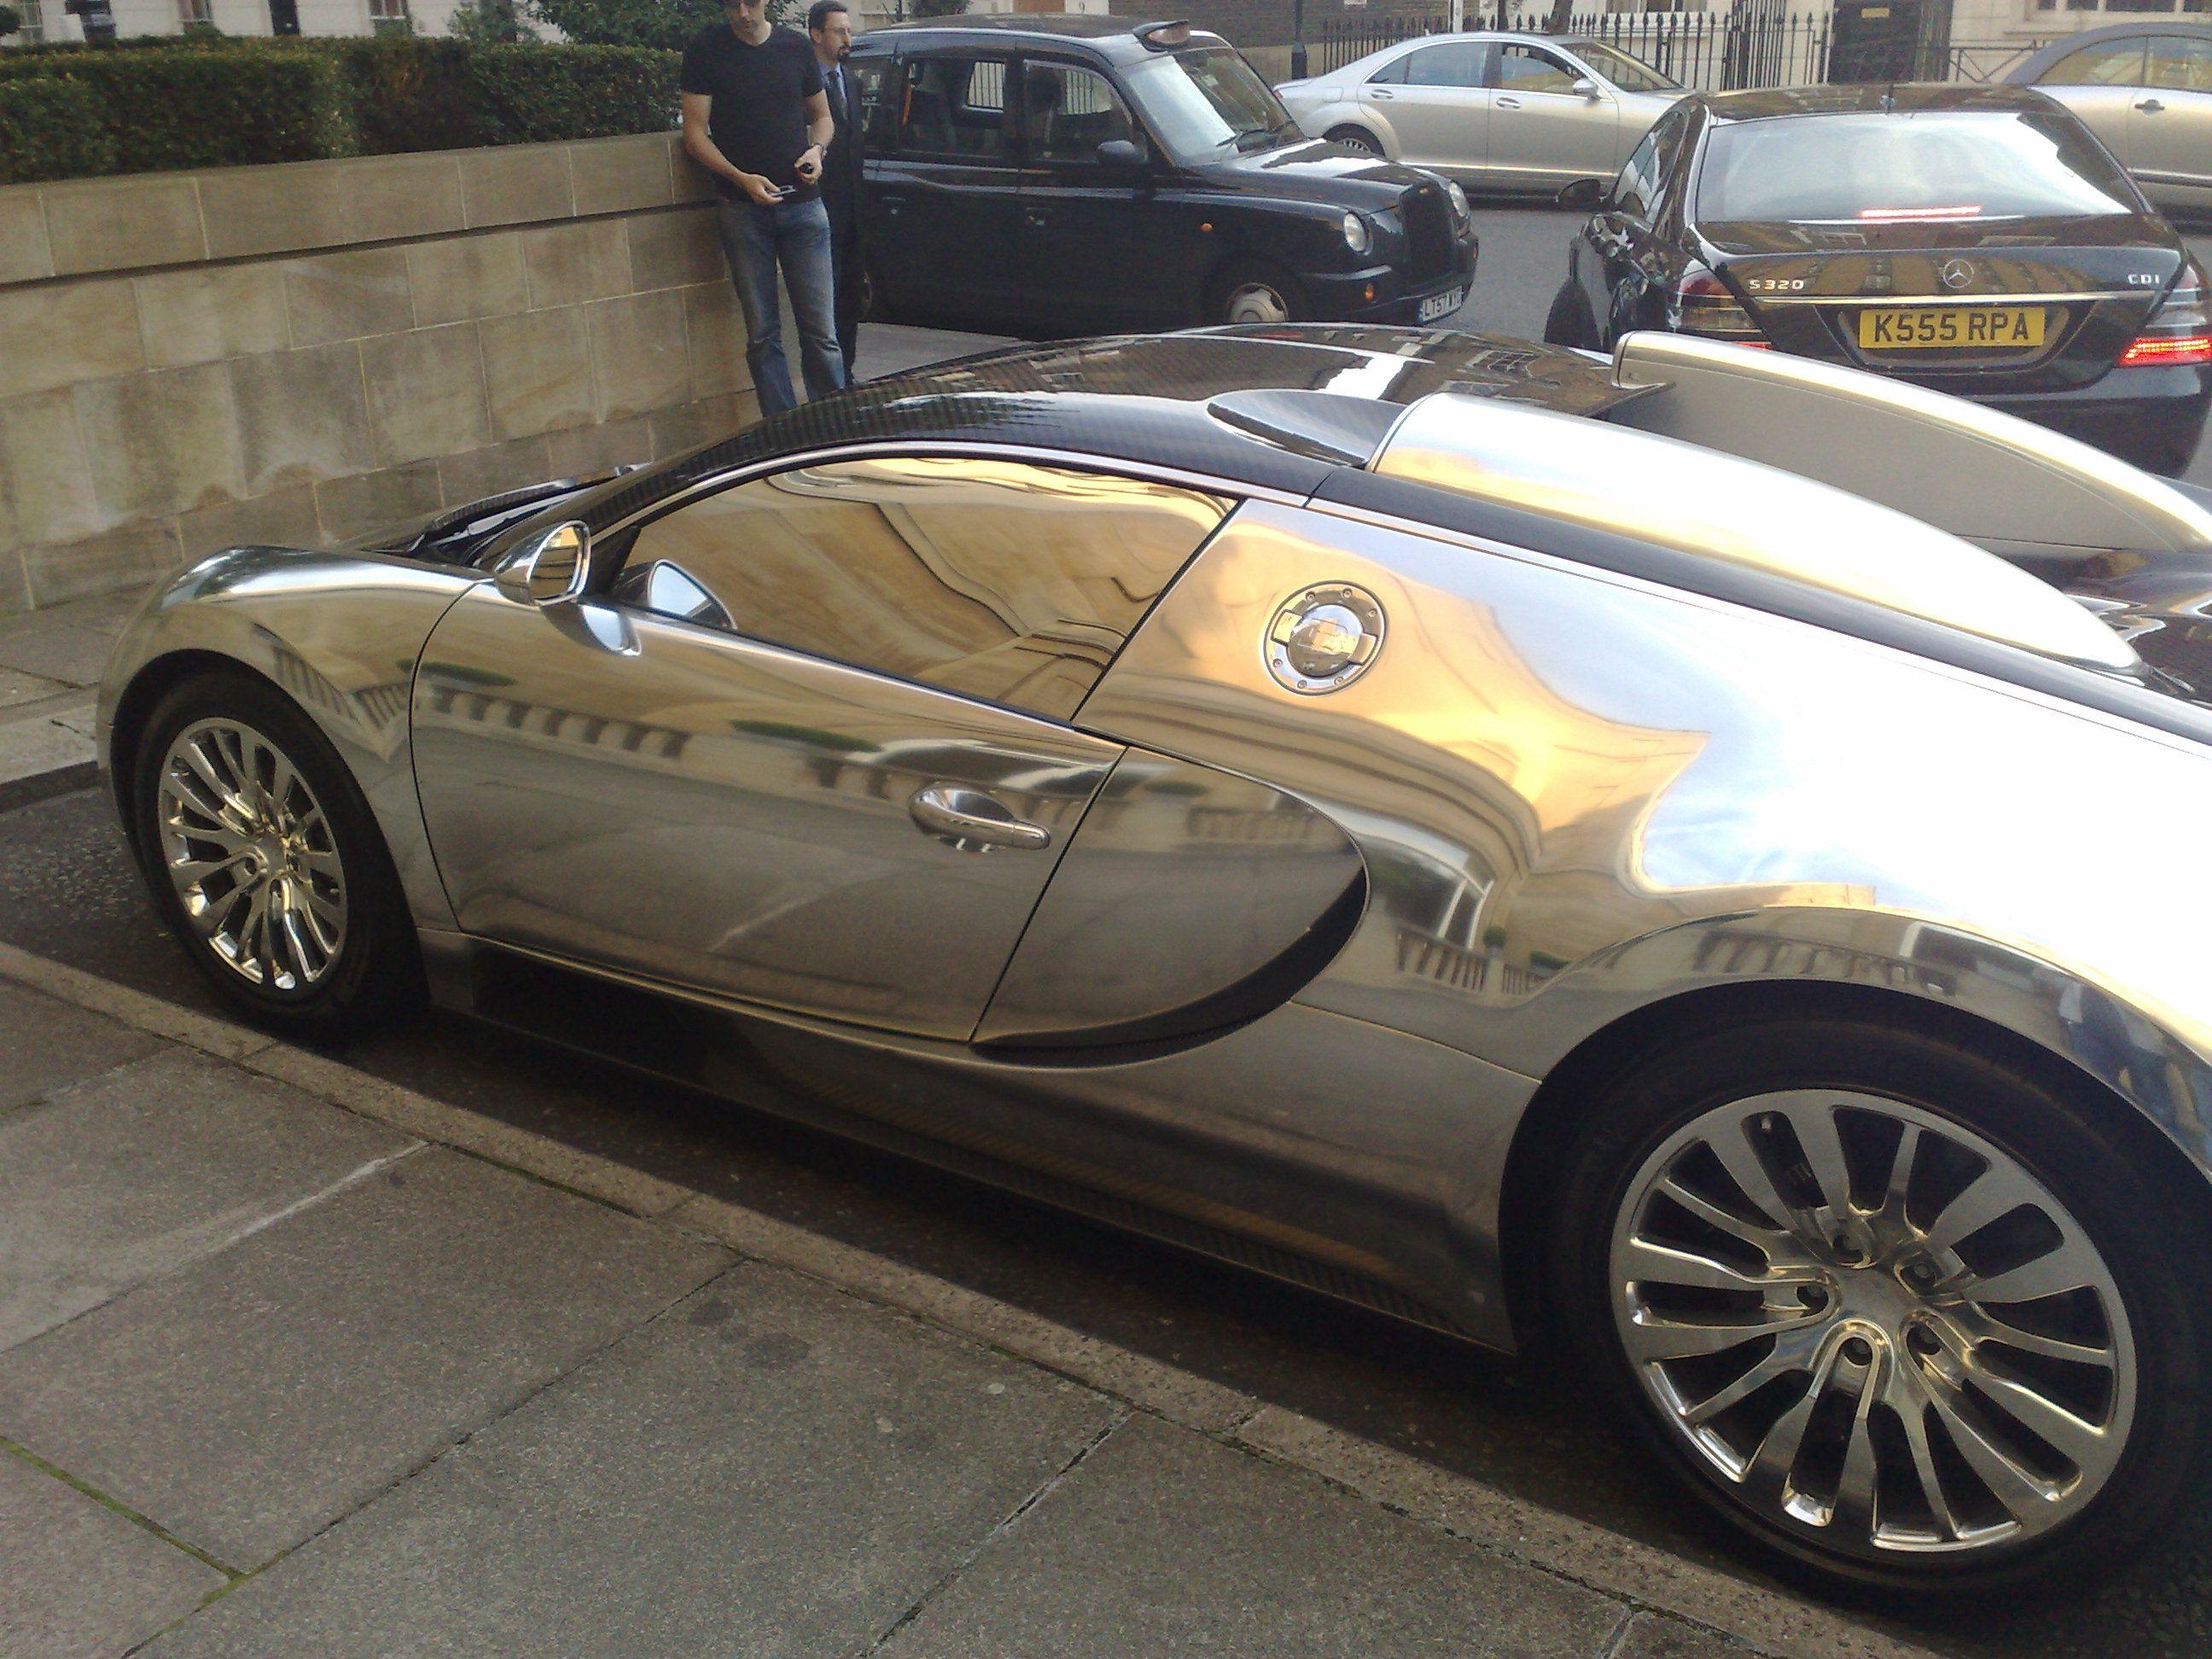 Dubai Chrome Cars Omgosh Chrome Cars Super Sport Cars Dubai Cars